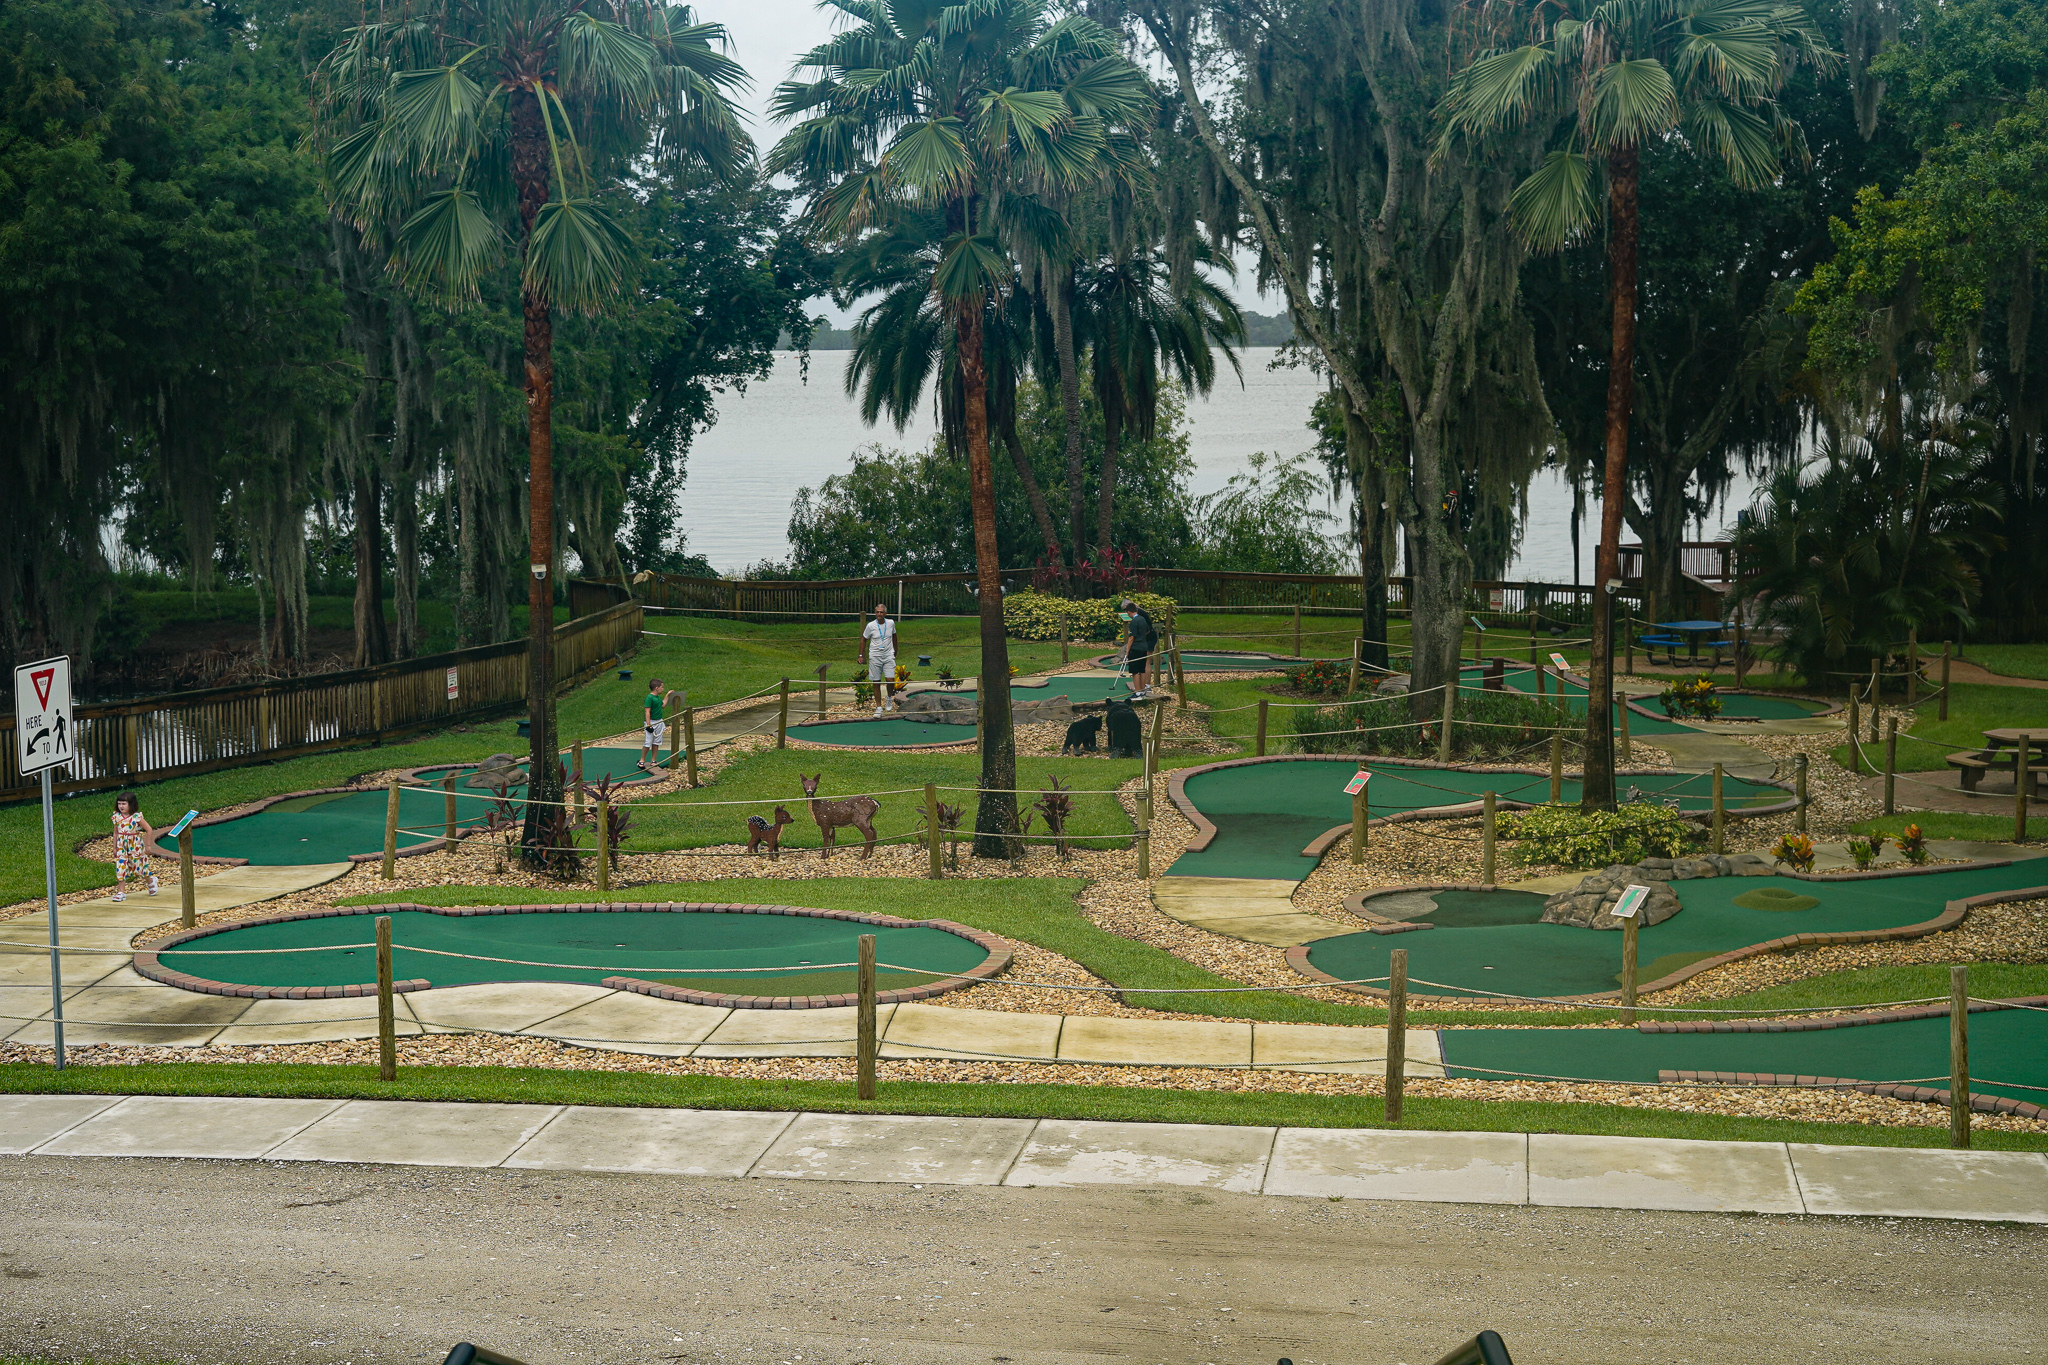 Mini golf course at Pirate Island Hotel.   A Guide to LEGOLAND Hotels in Florida